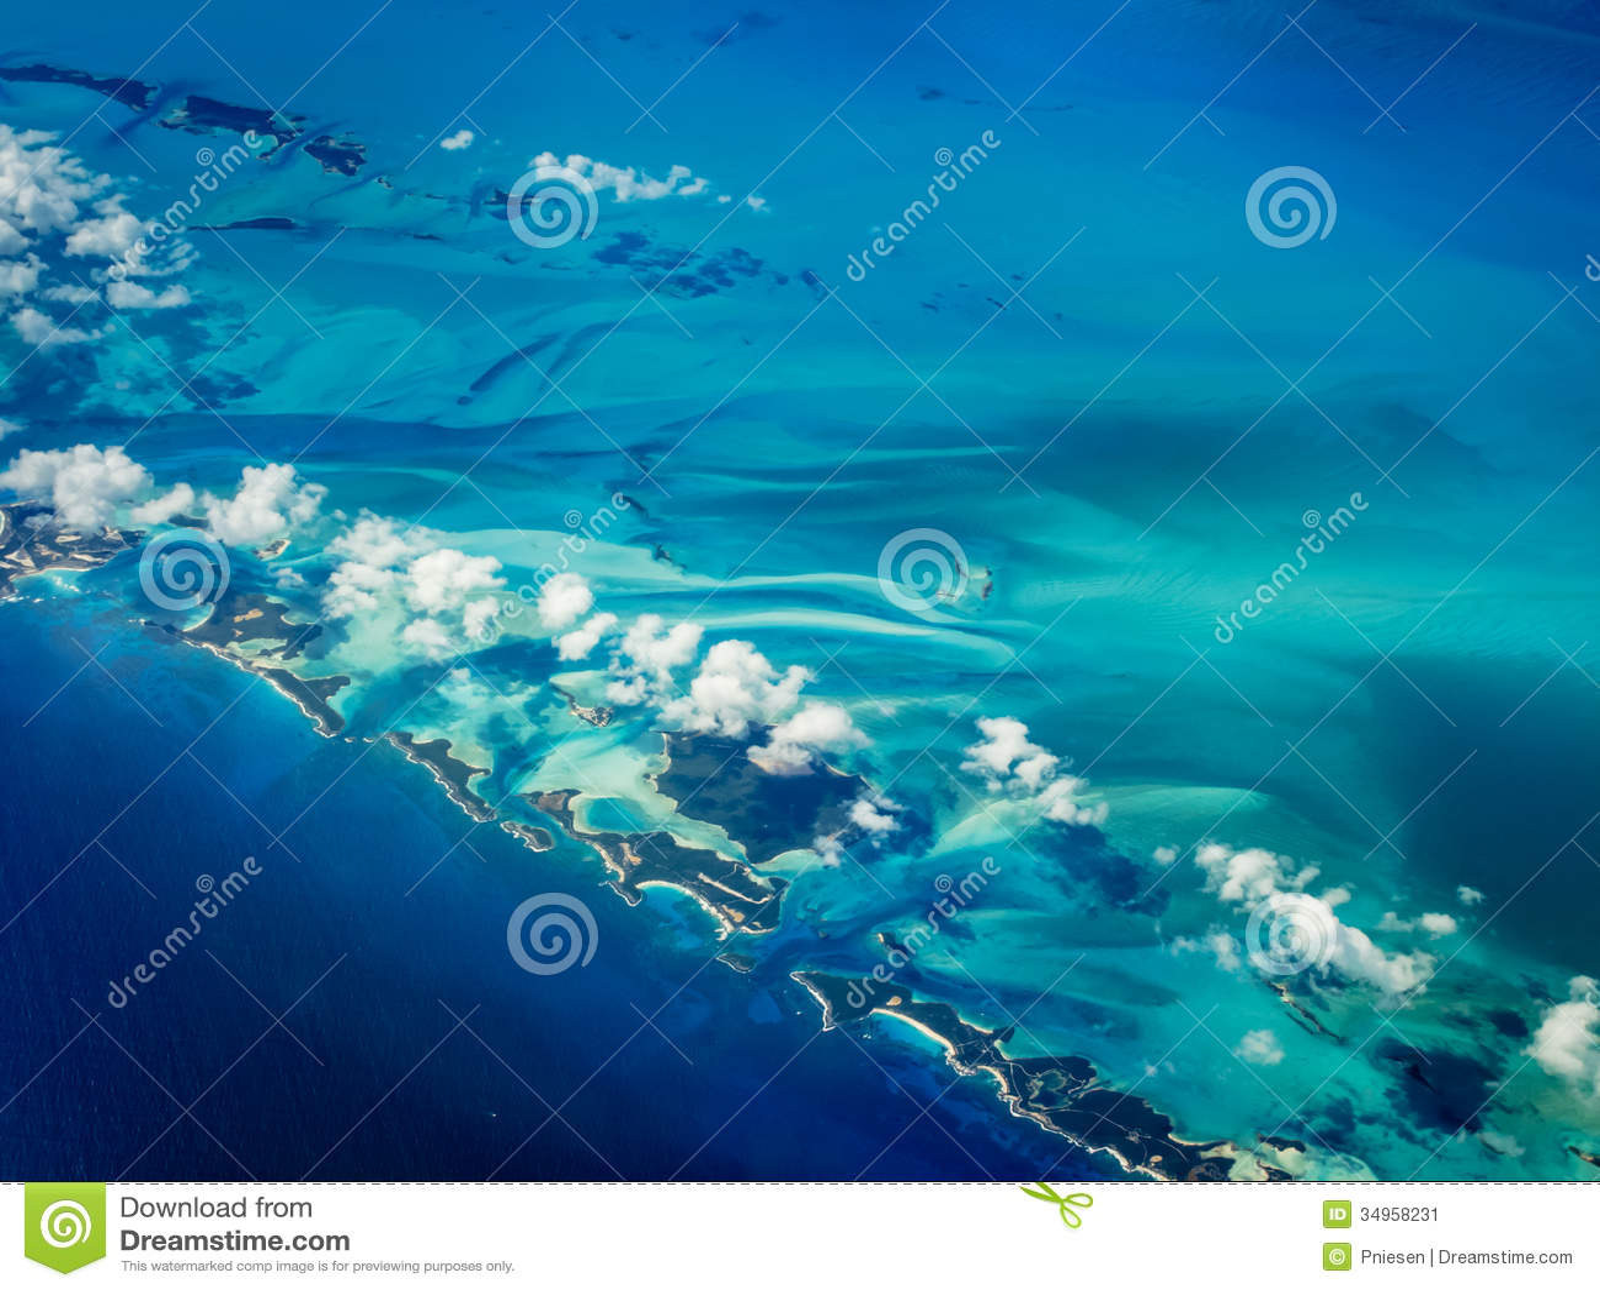 Aerial view of Caribbean islands chain creating a blue desert contour